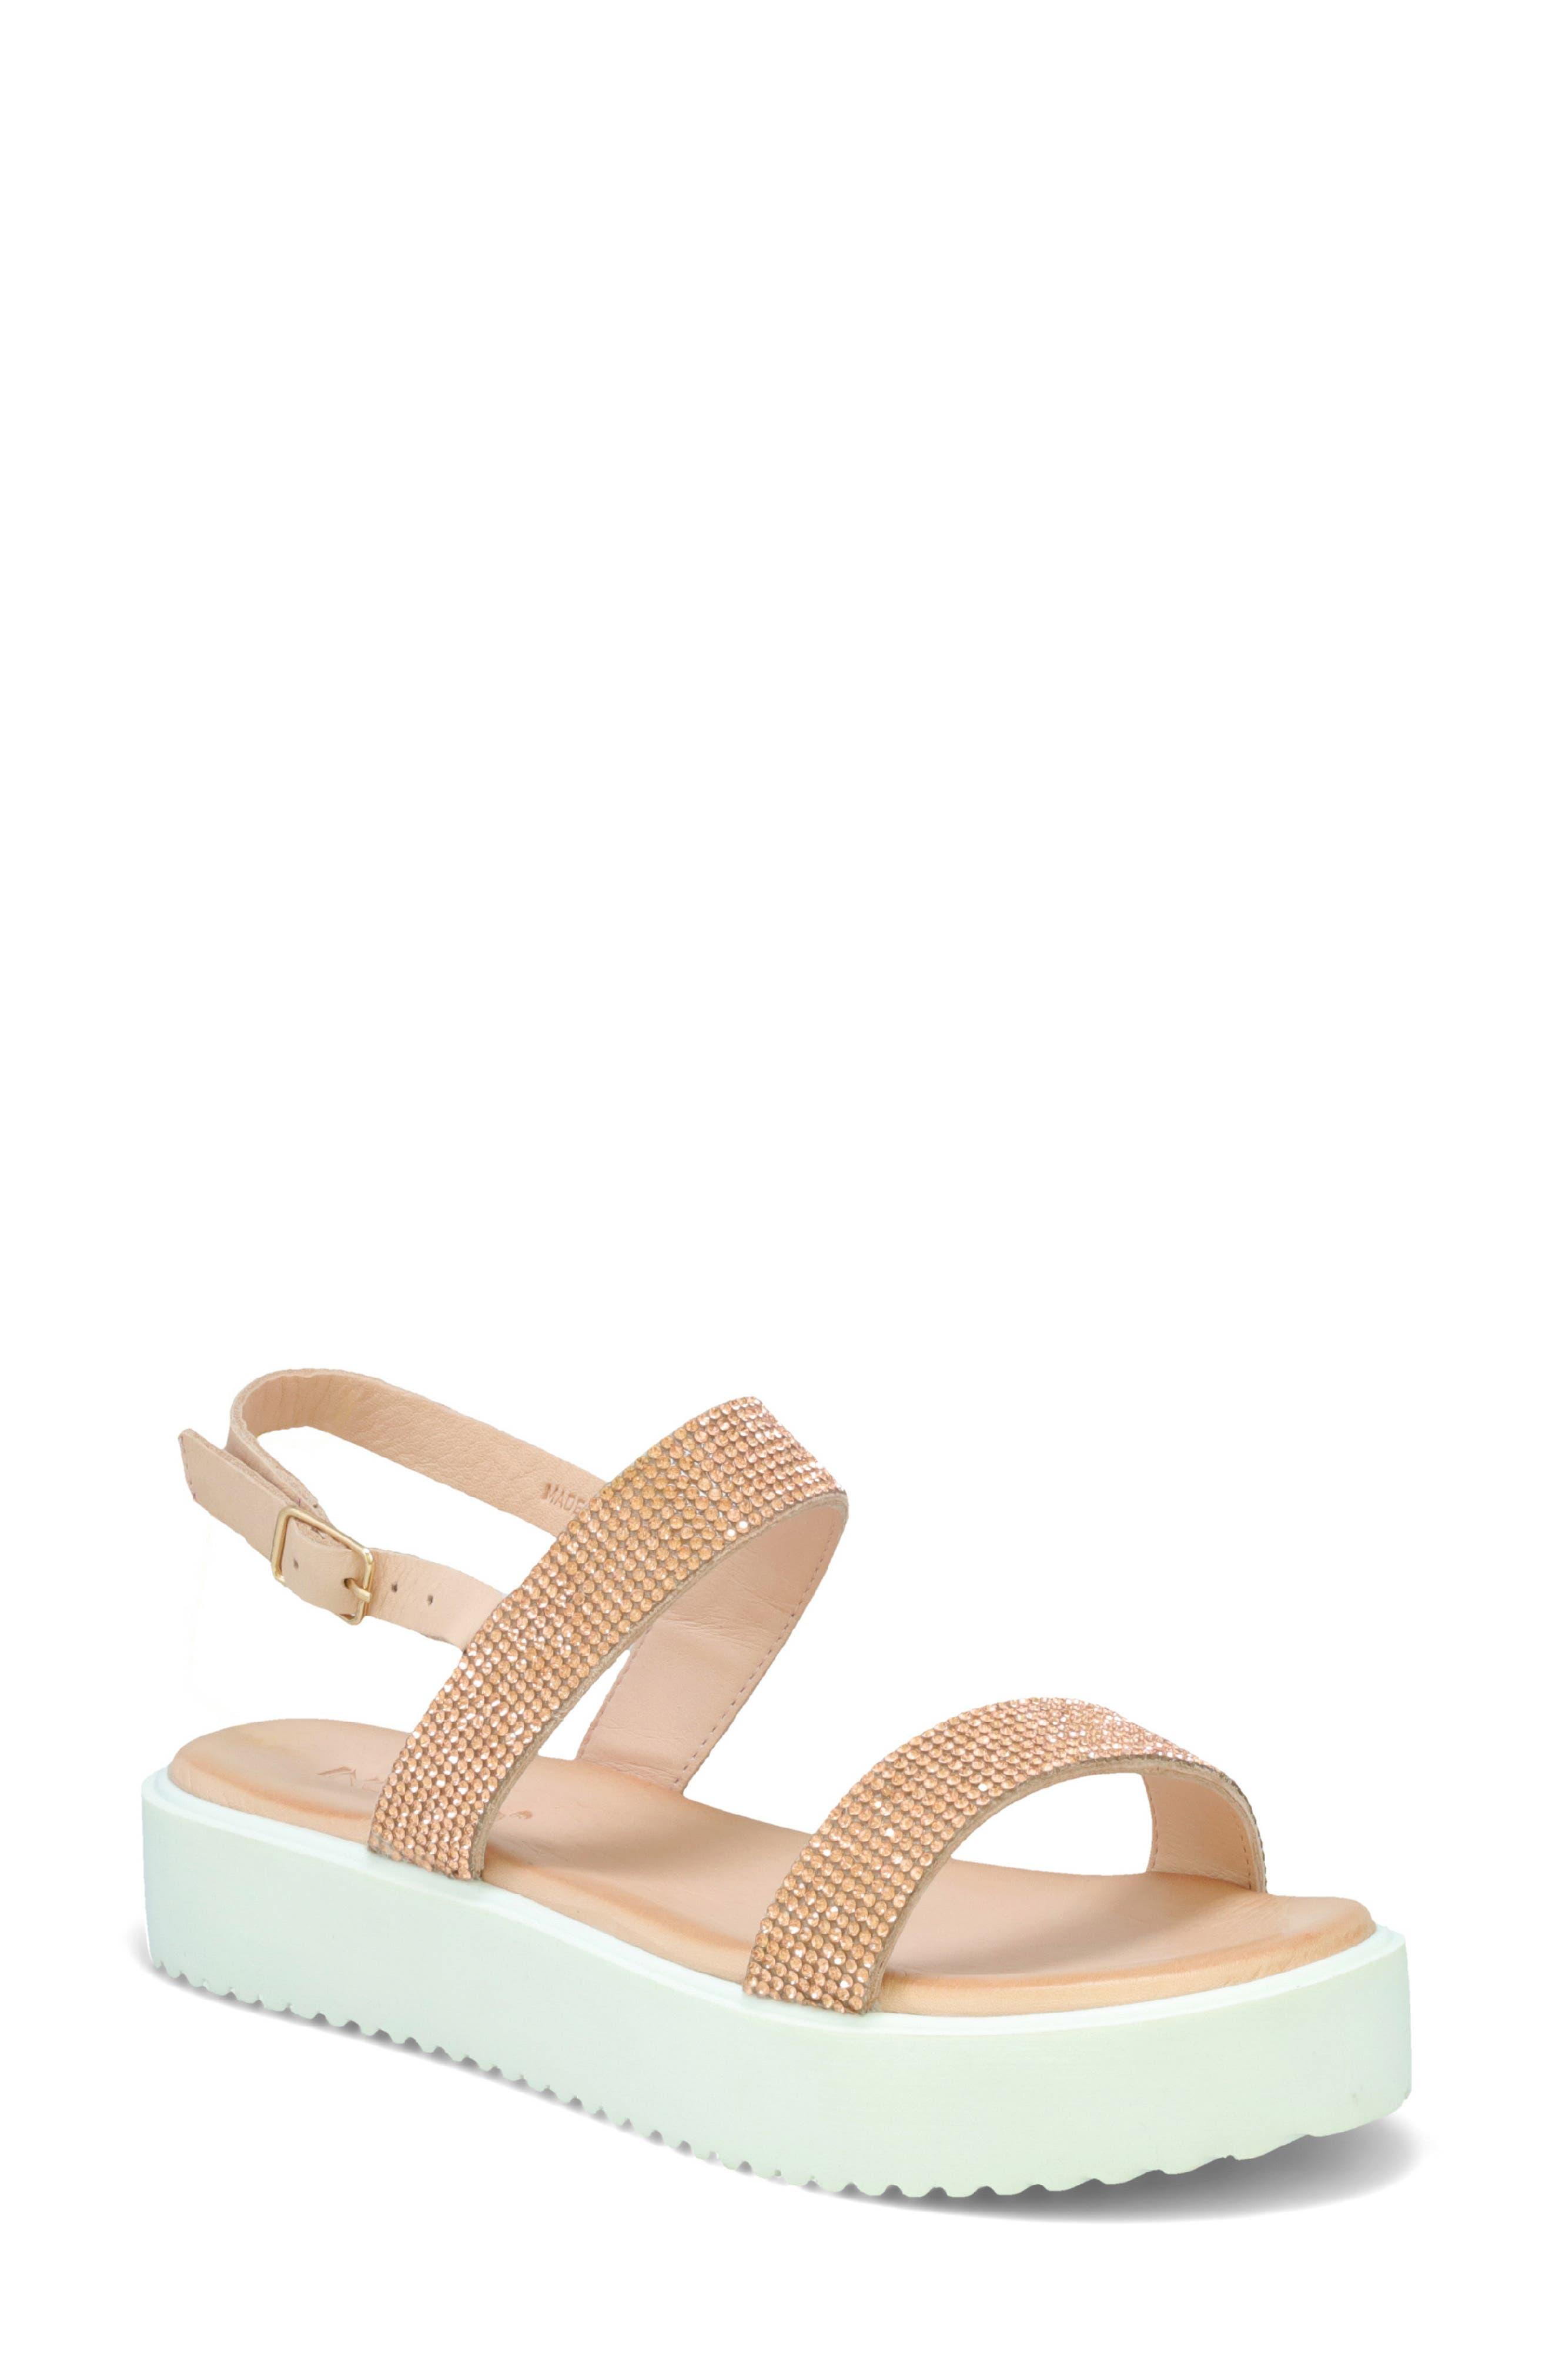 Inuovo Jaden Platform Sandal